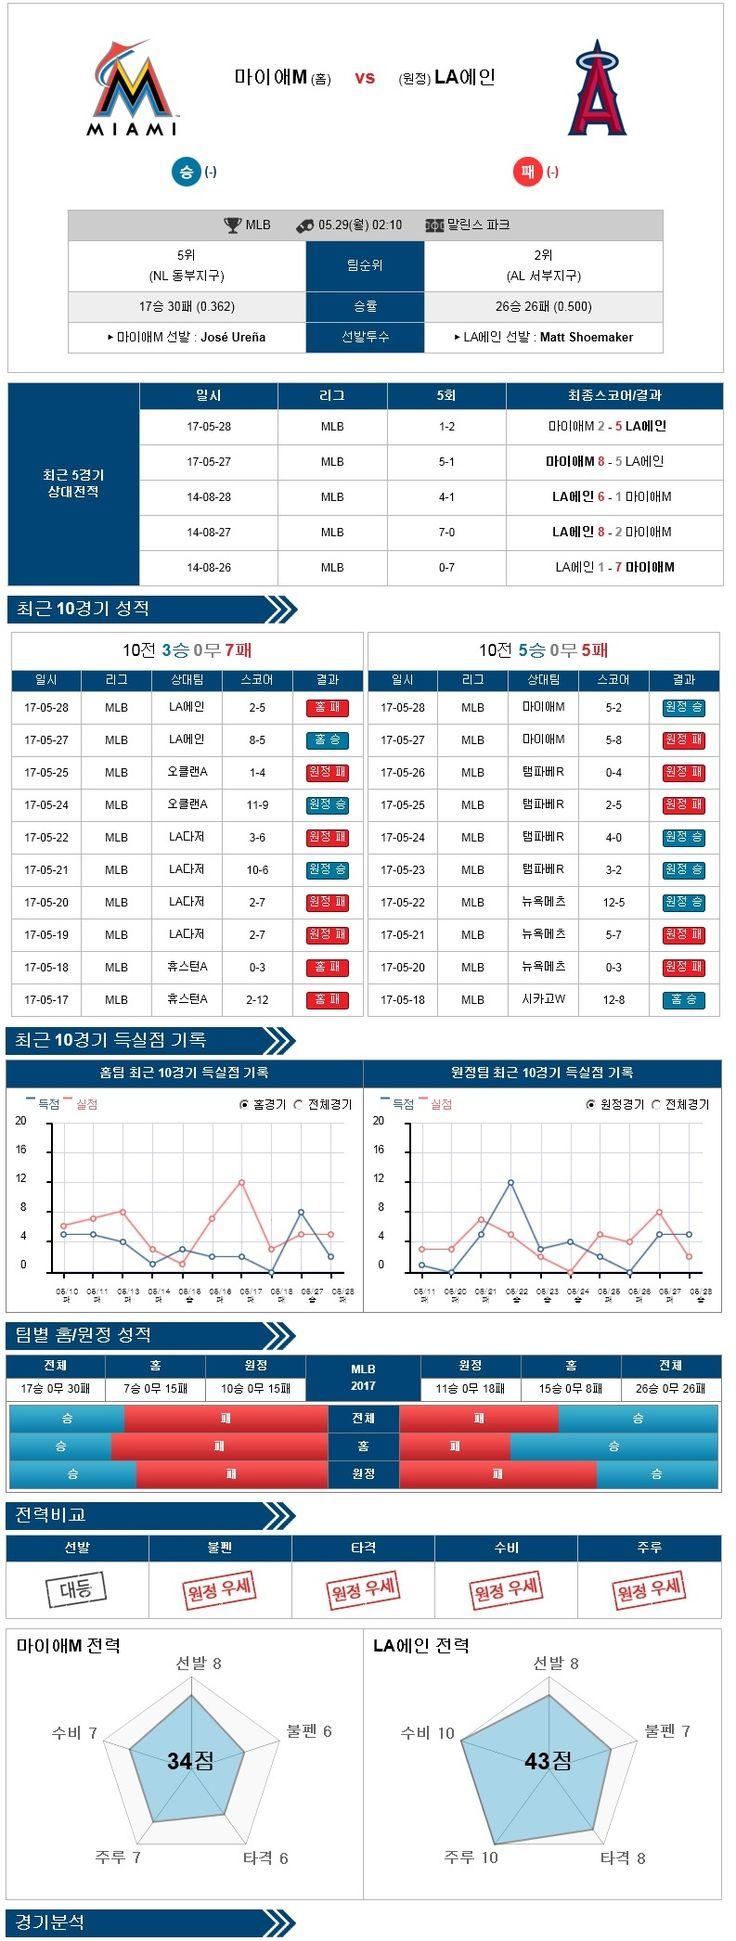 [MLB] 5월 29일 마이애미 vs LA엔젤스 ★토토군 분석★